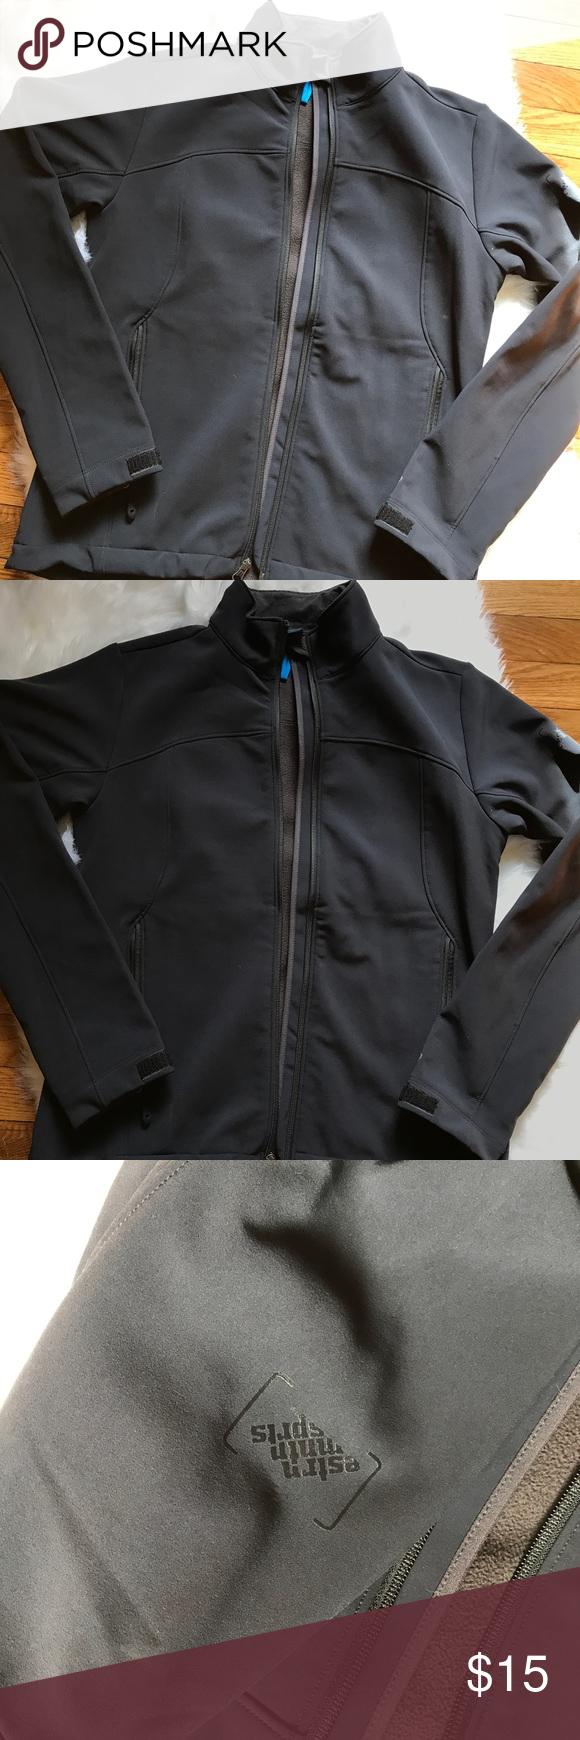 Black zip up jacket black fleece lined jacket only wore once itus